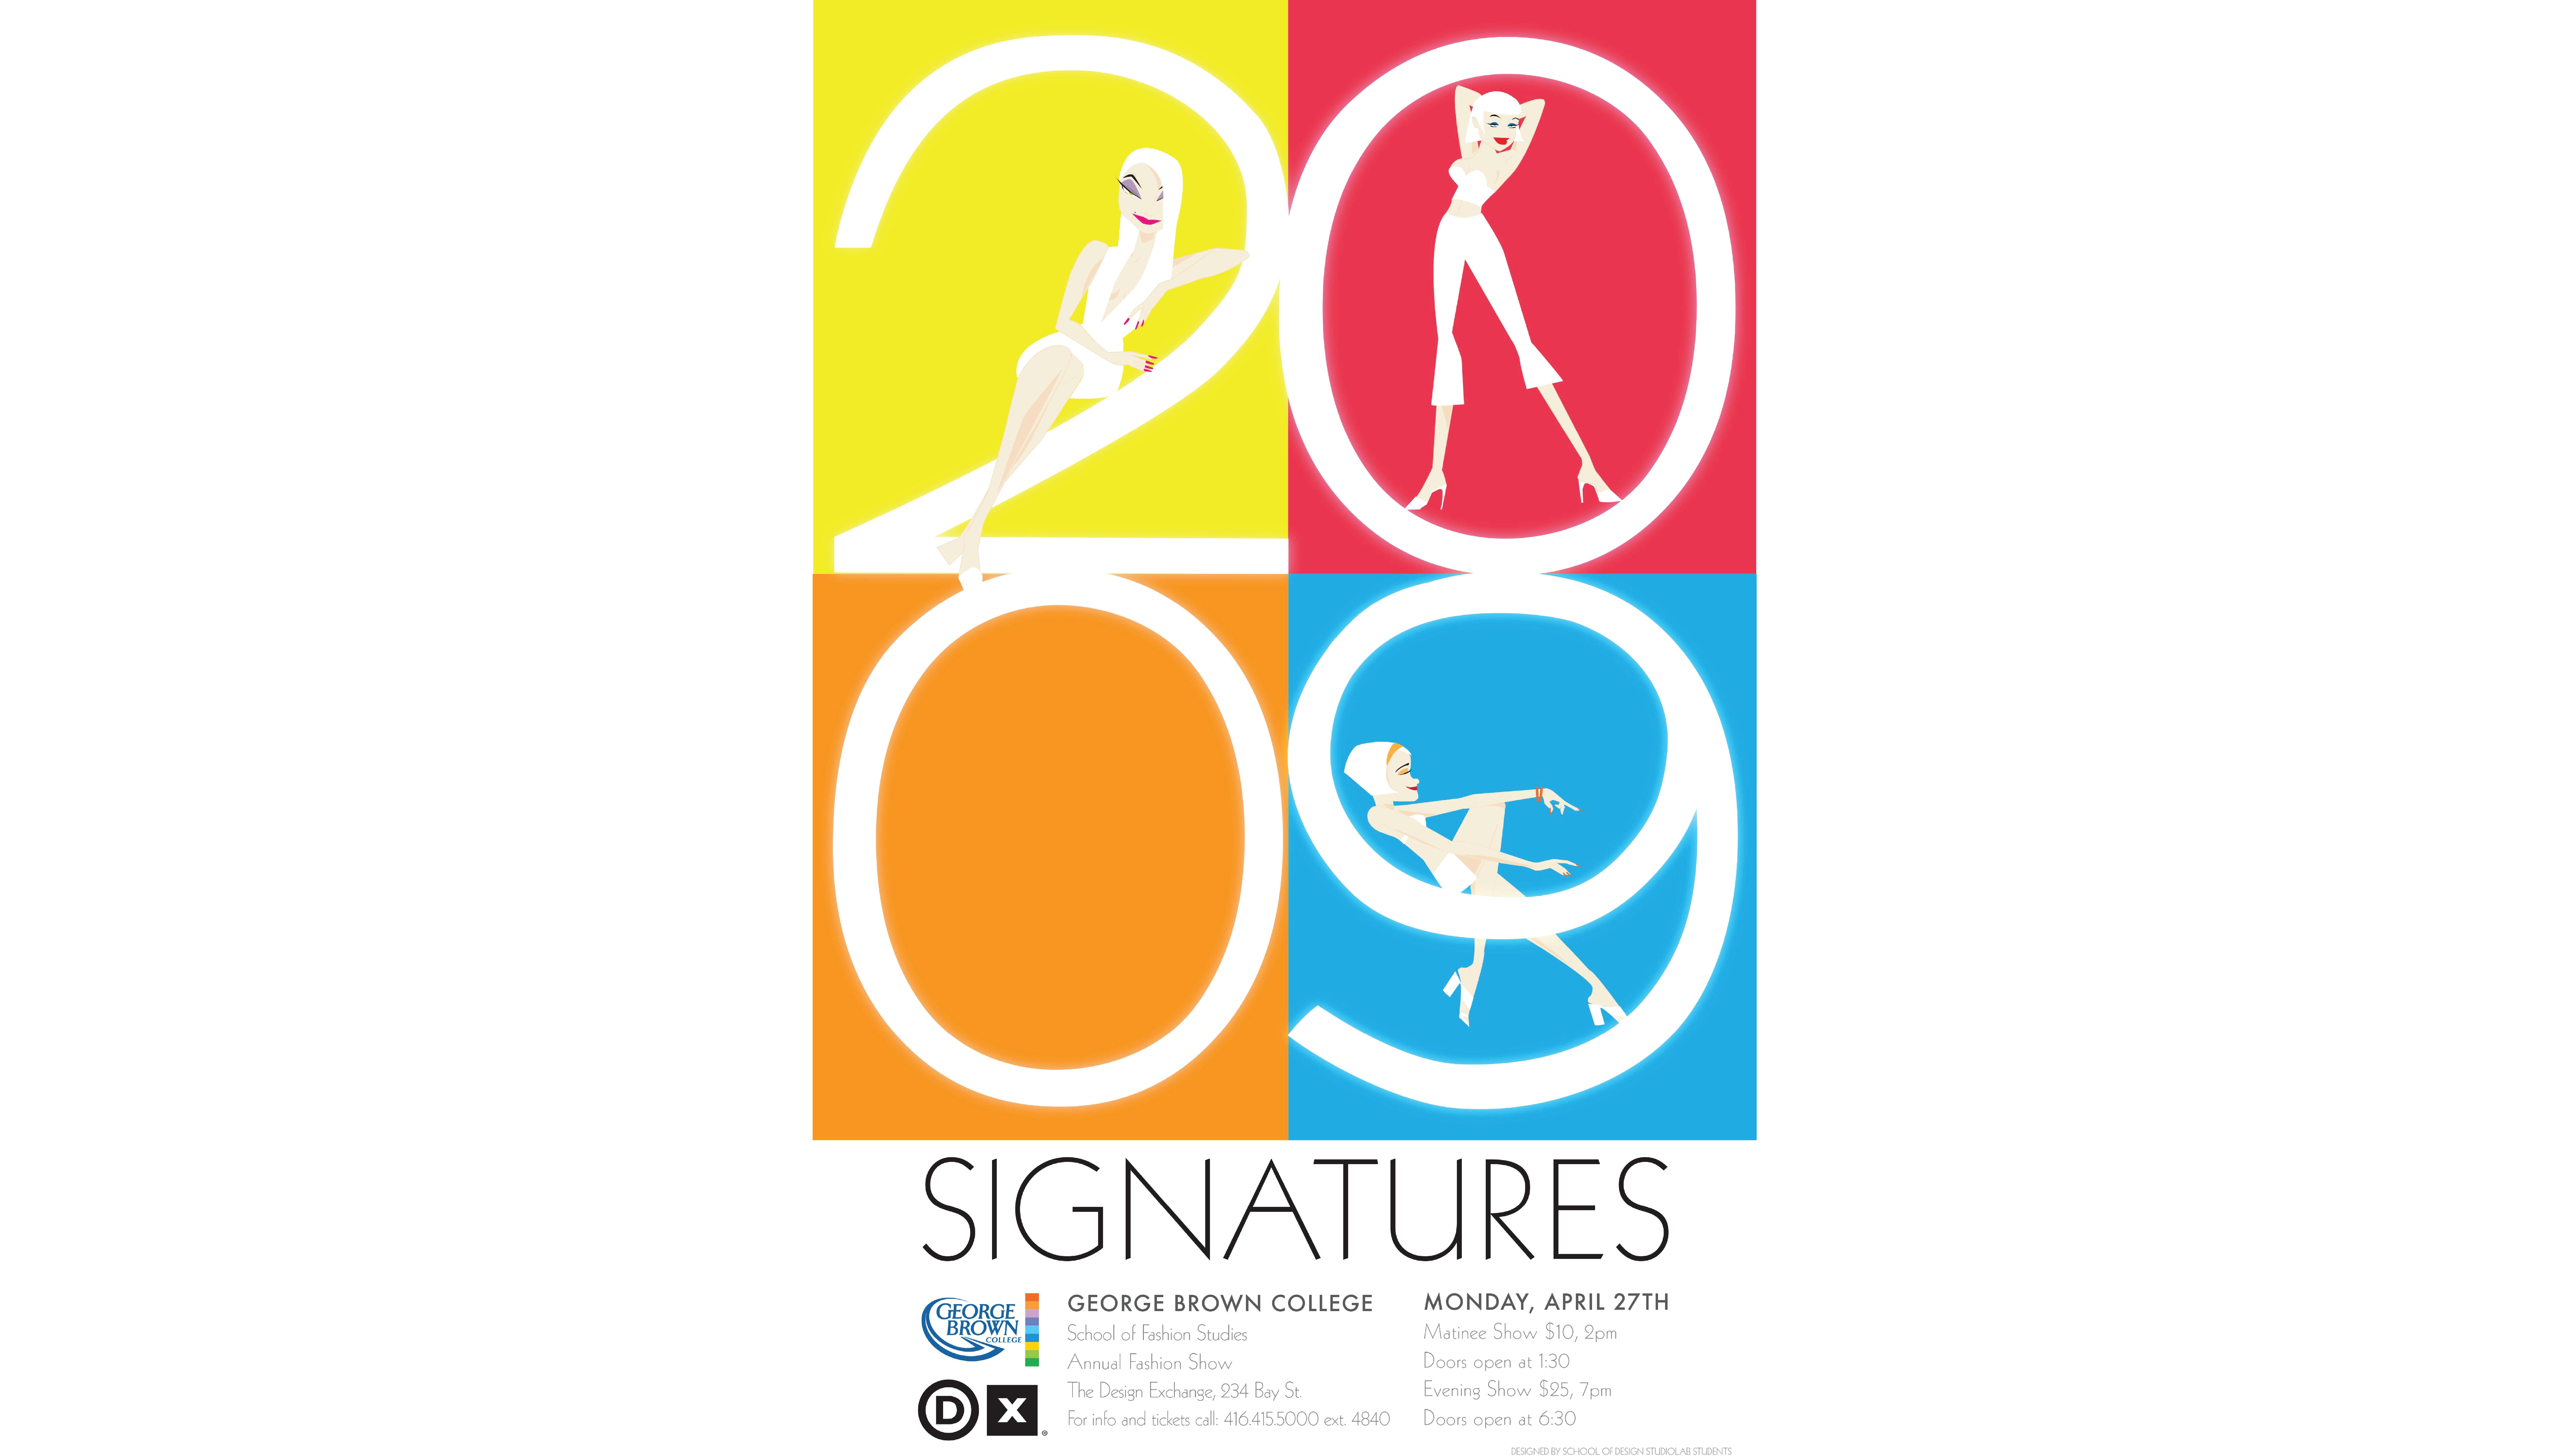 2009 signatures v2-01